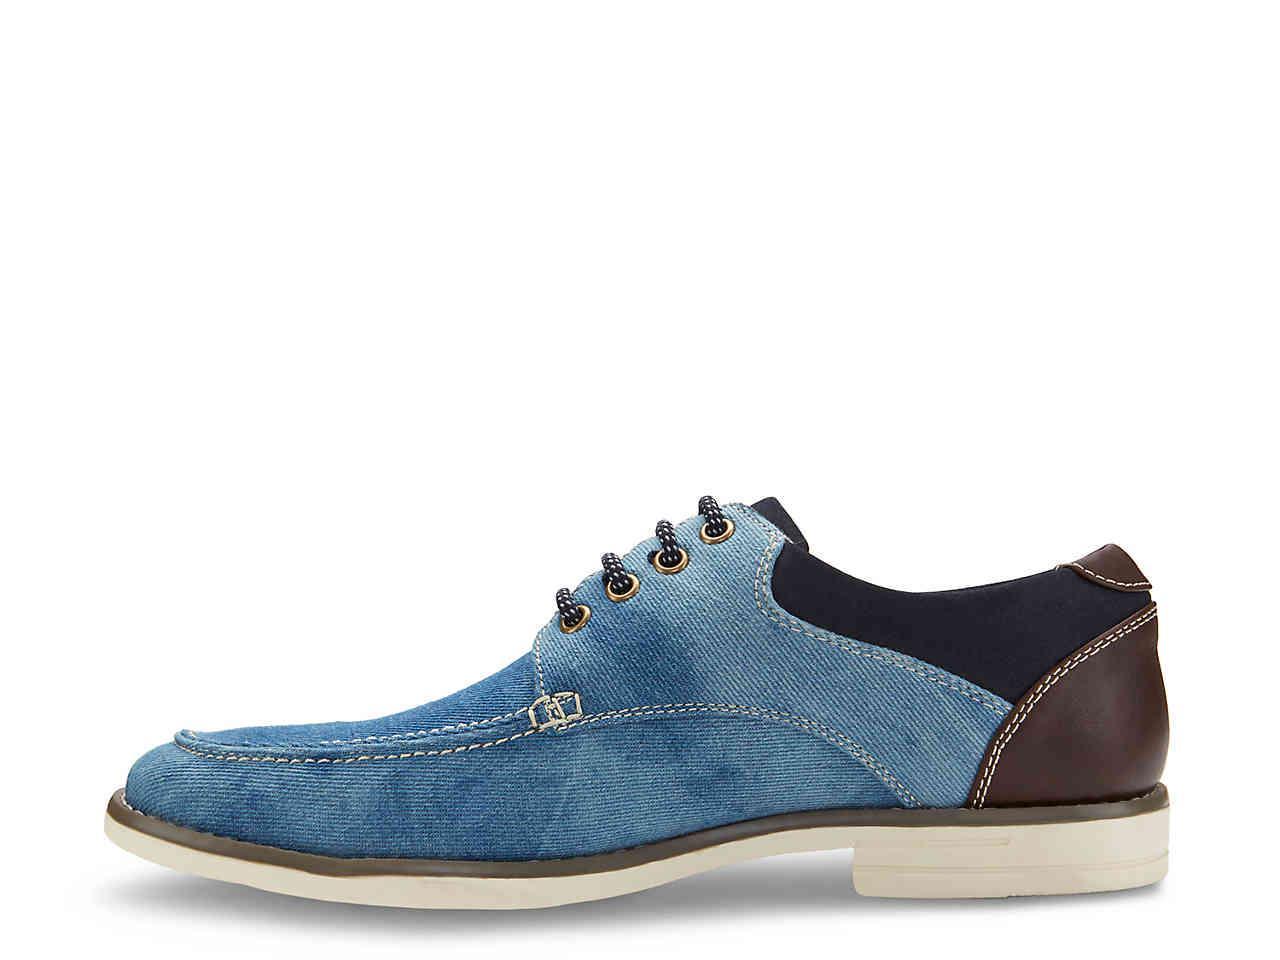 b8b9a7da341 Lyst - Xray Jeans Leland Oxford in Blue for Men - Save ...